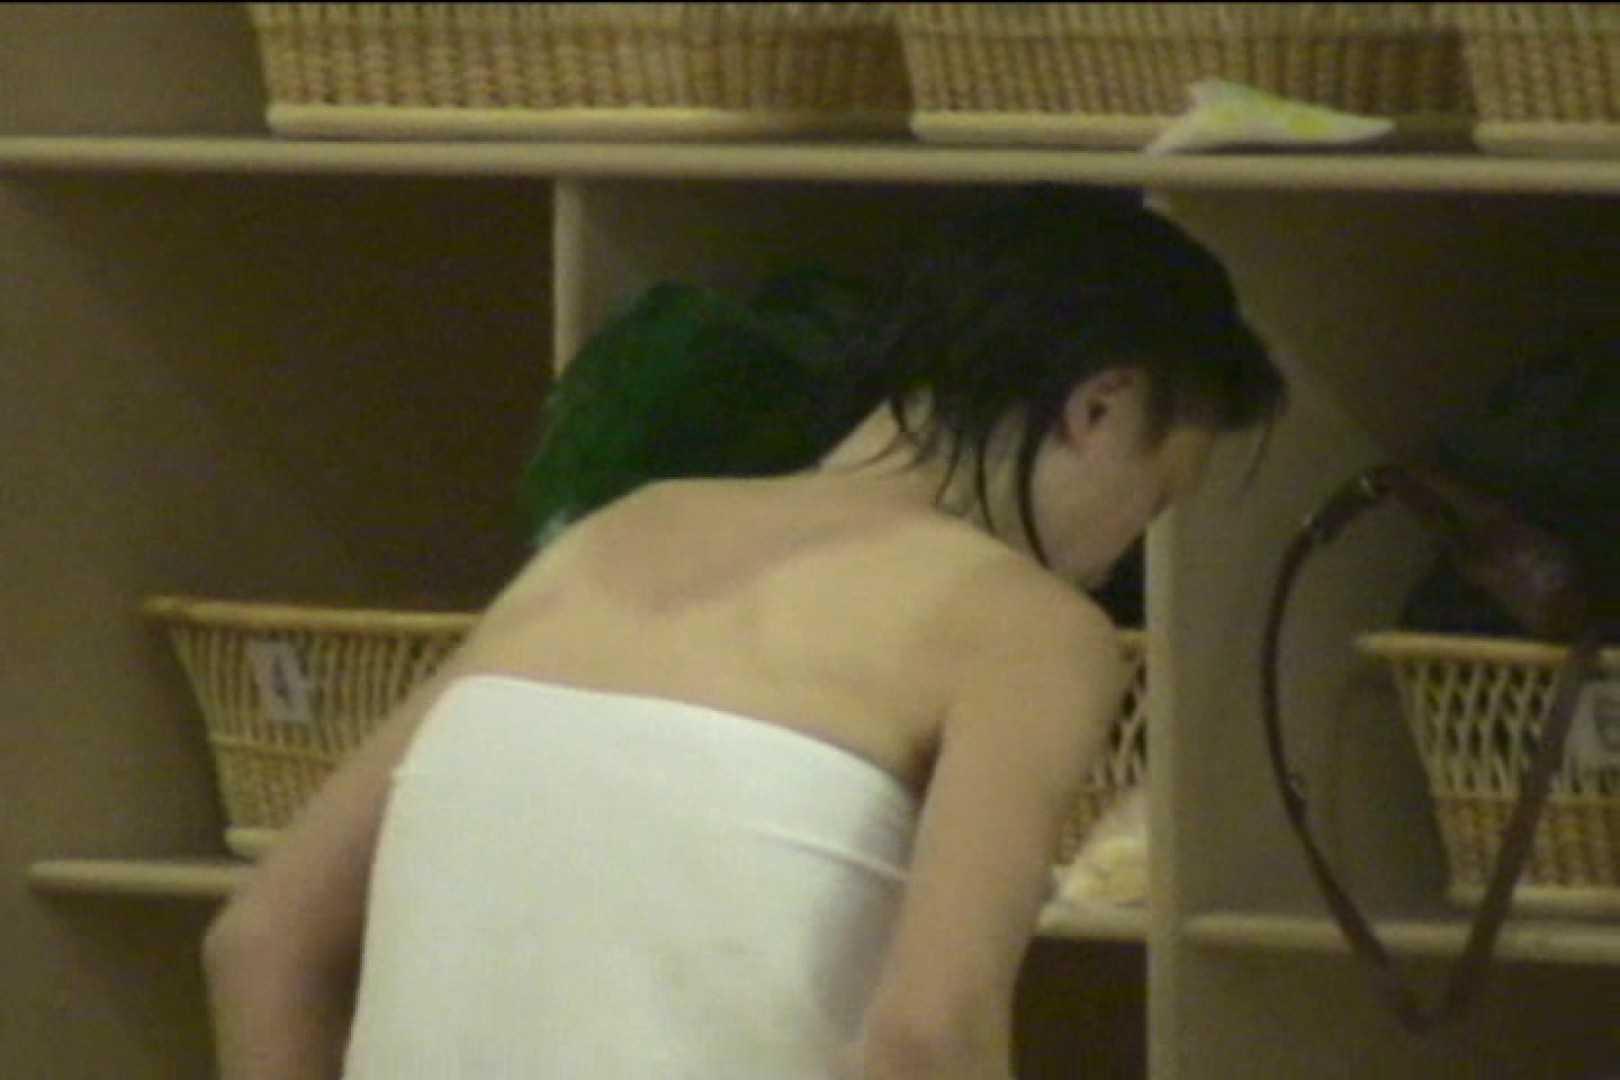 Aquaな露天風呂Vol.454 露天   HなOL  66pic 40